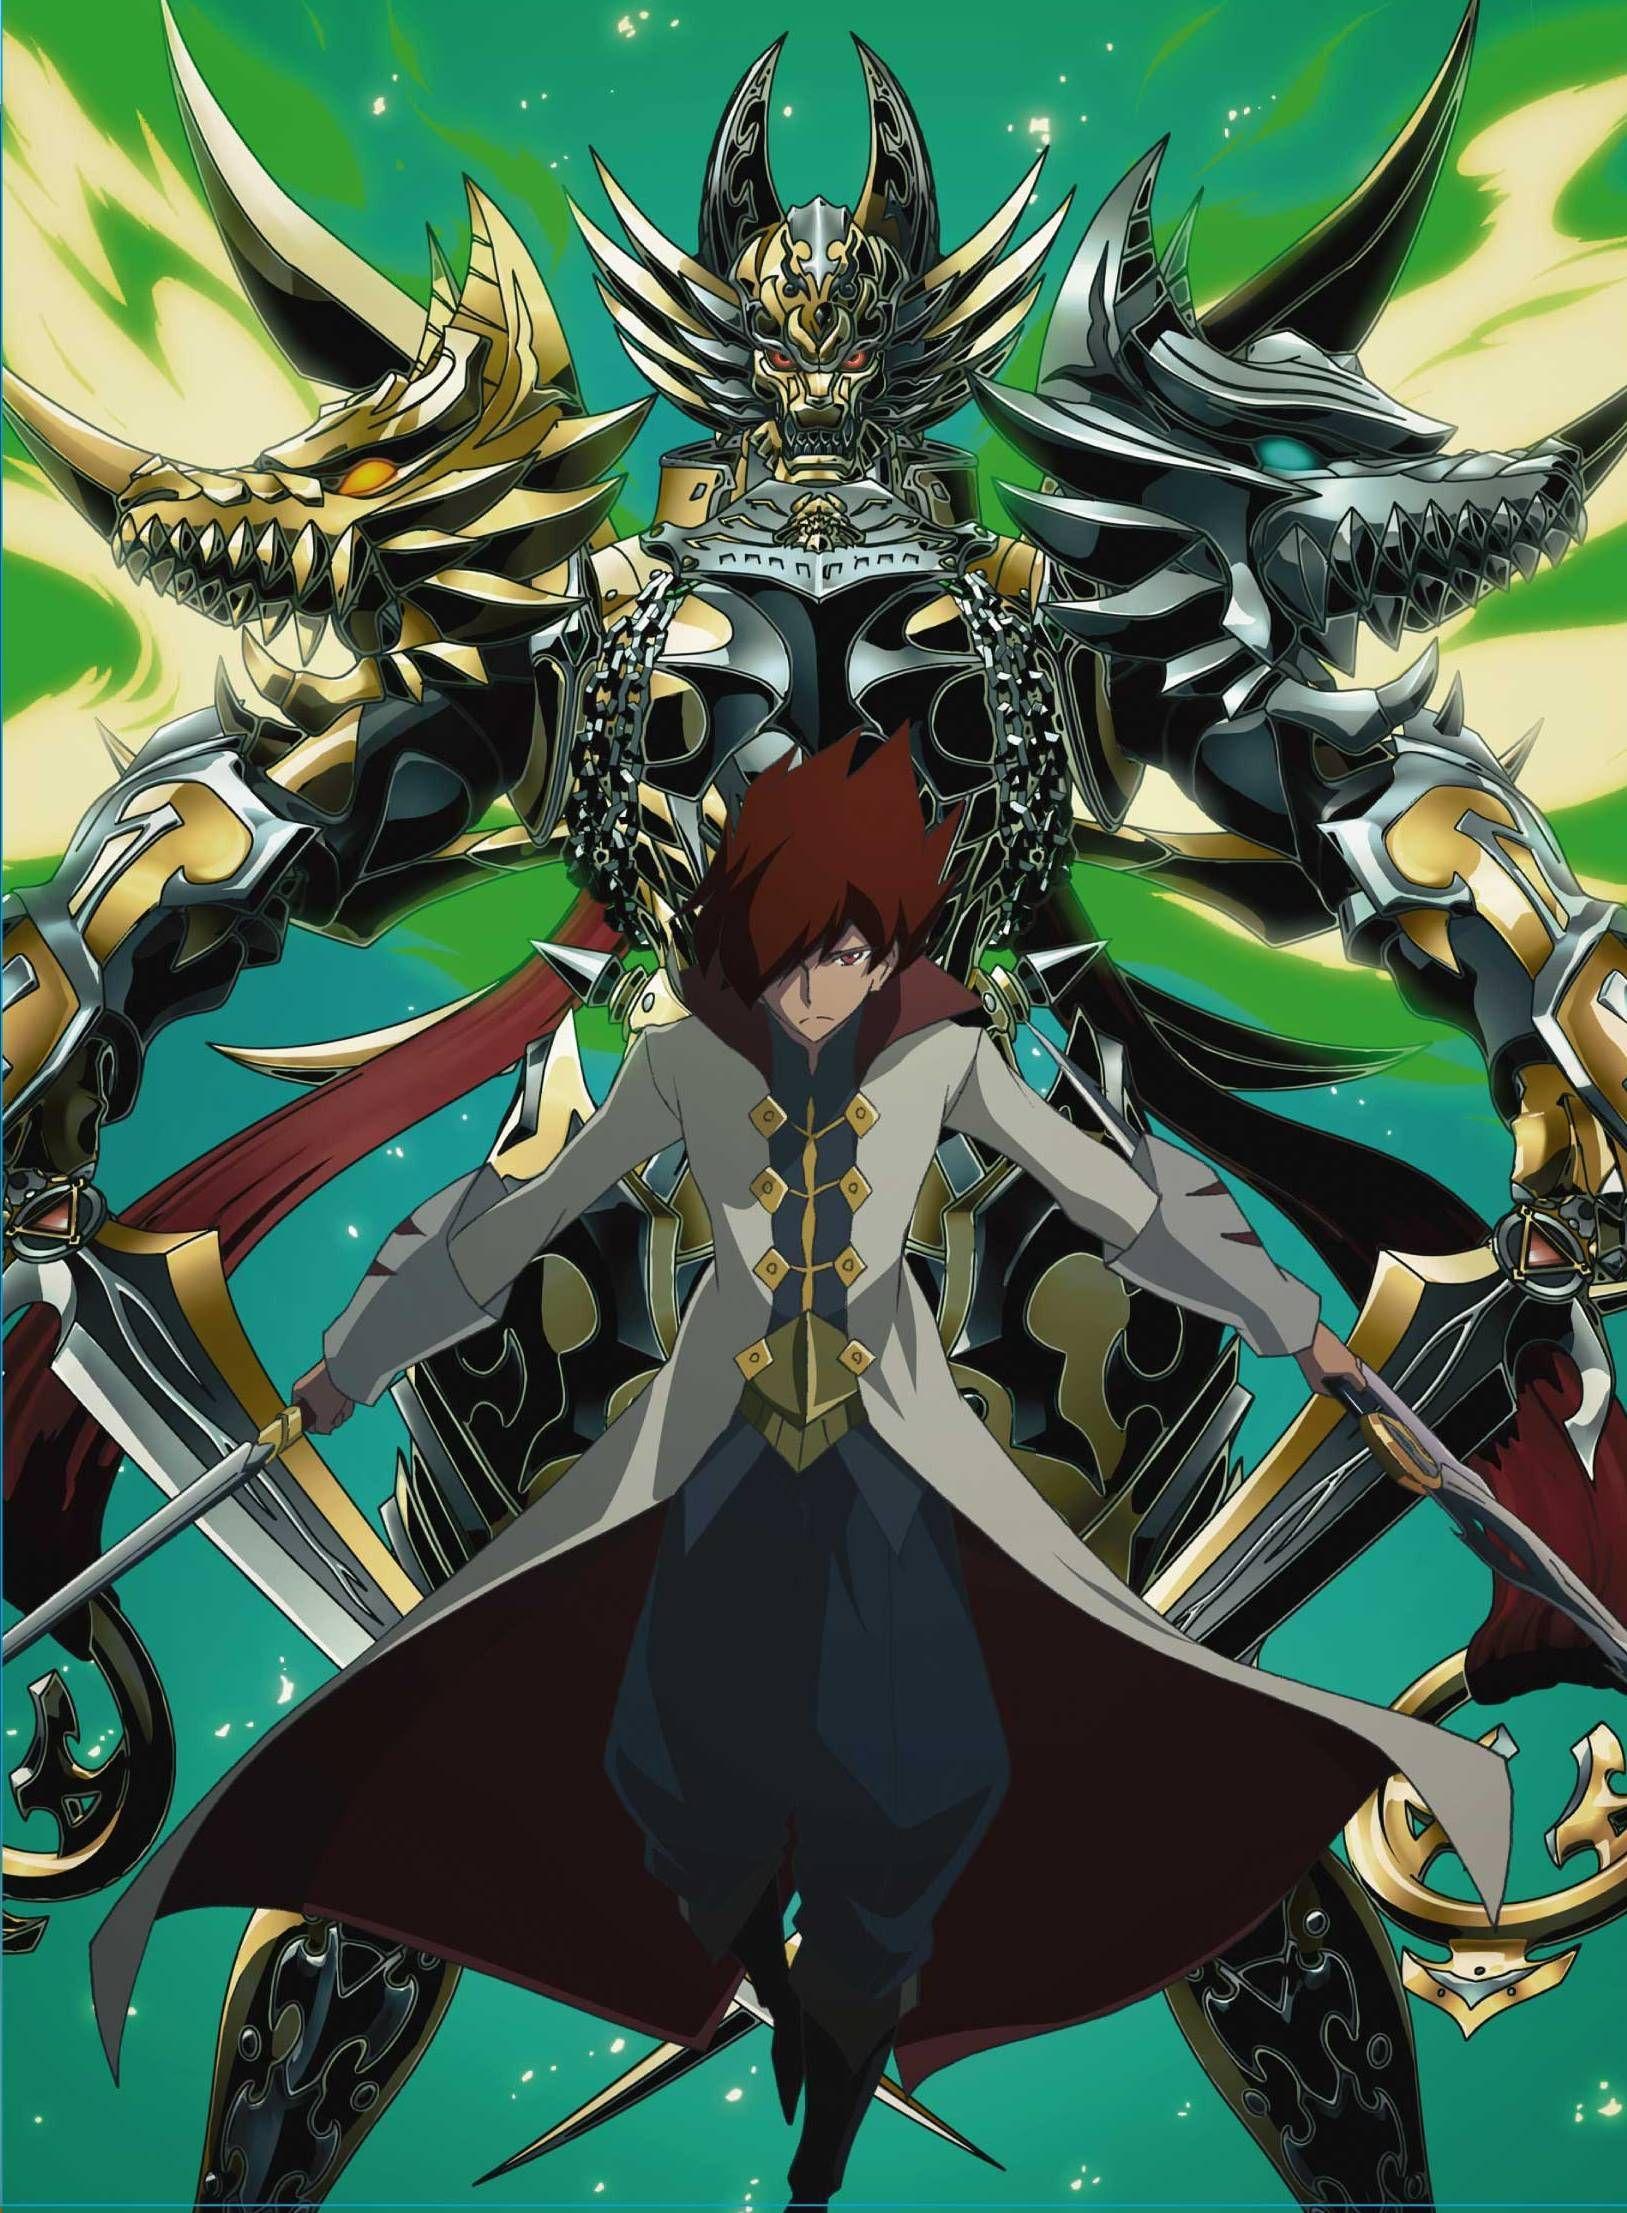 Garo Wolf Anime Knight Anime Fantasy Warrior